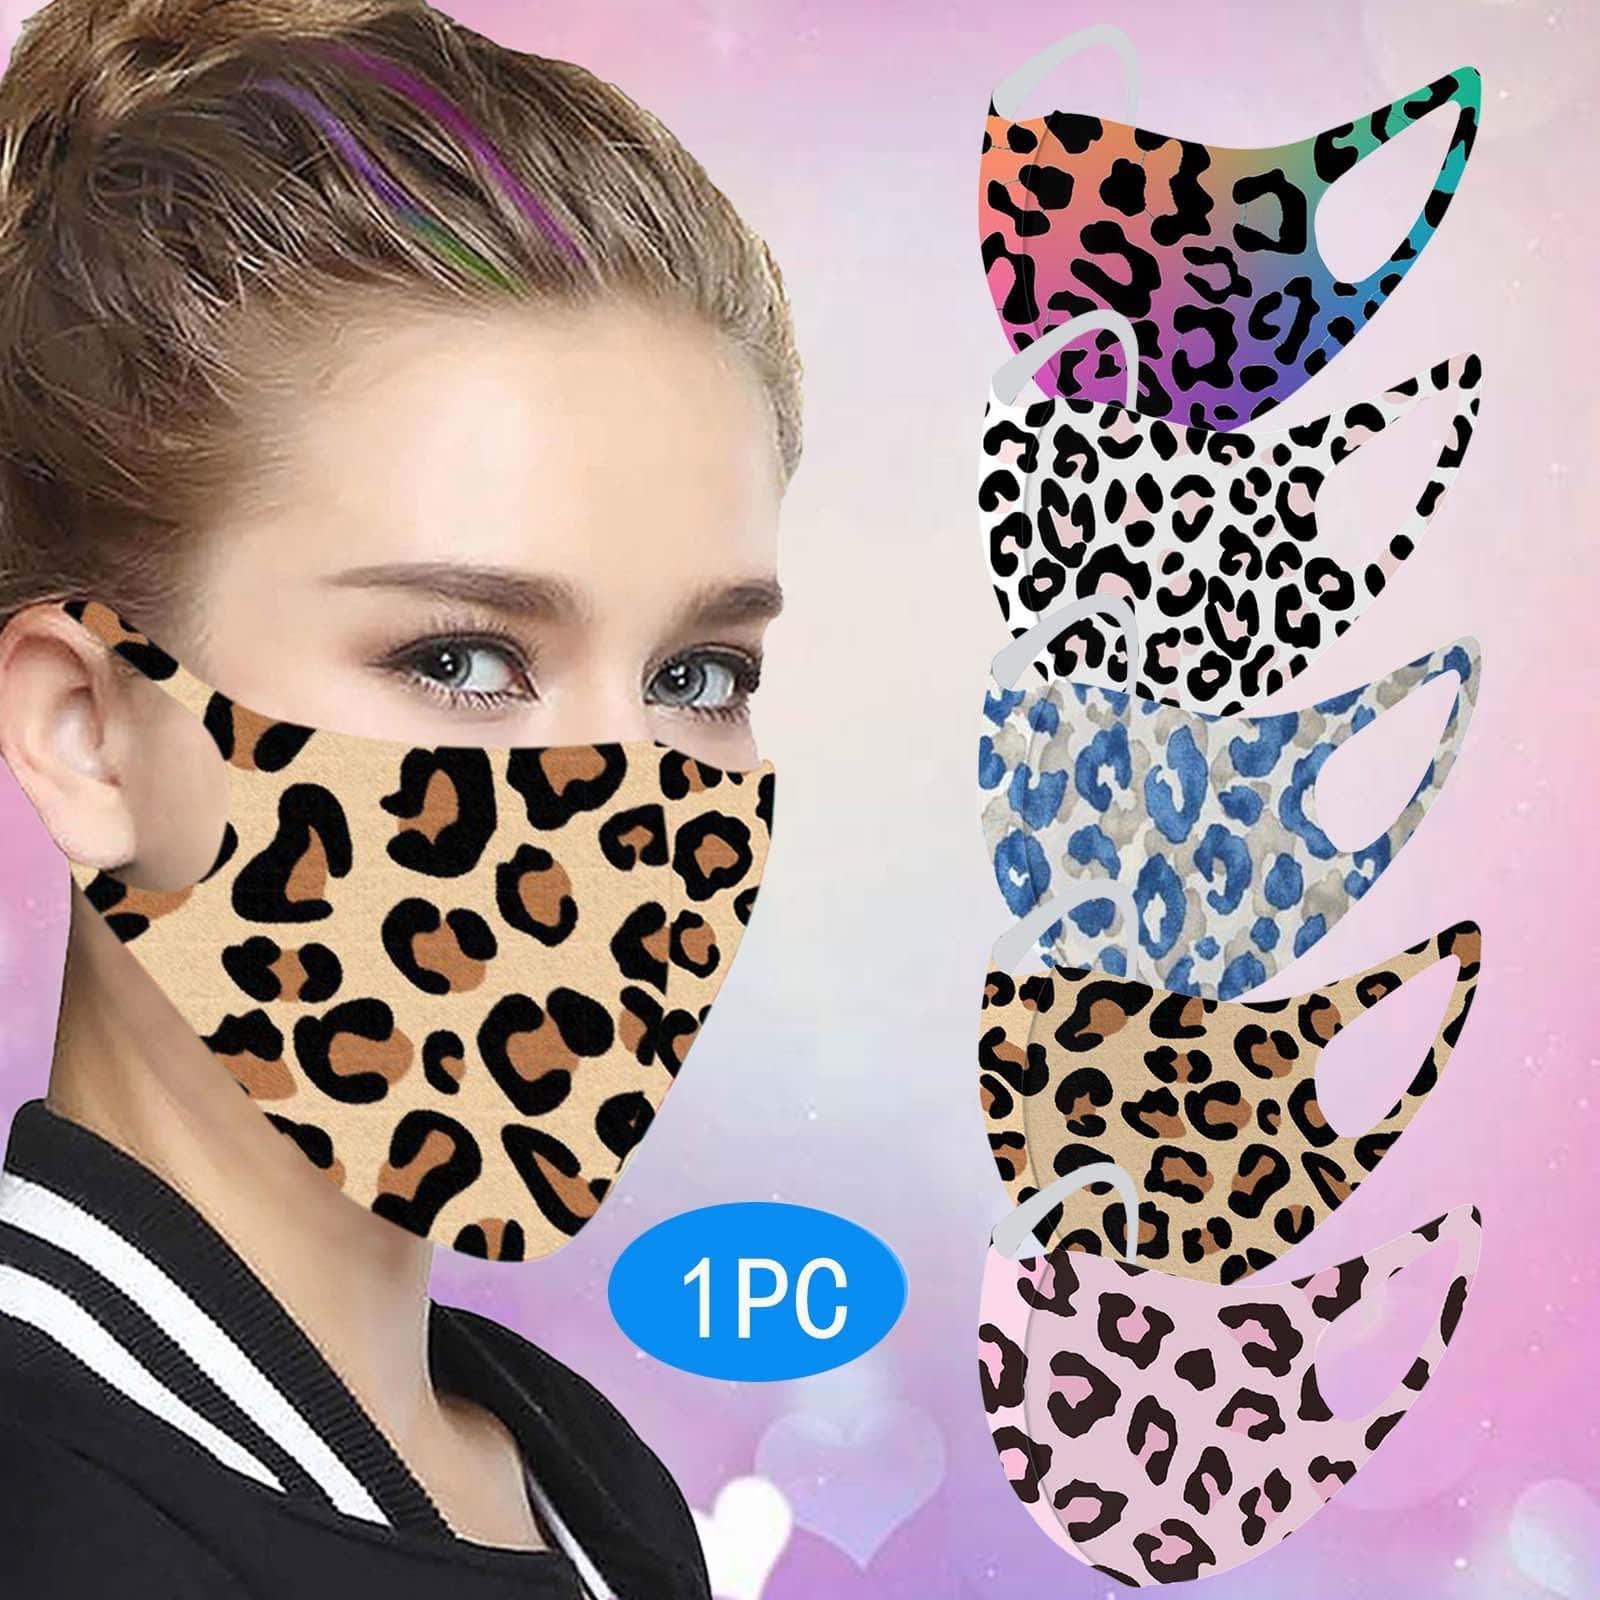 Mascarilla-1pc-Adult-Face-Masks-Washable-Leopard-Print-Ice-Silk-Mask-Reusable-Mouth-Mask-Face-Mask-7.jpg